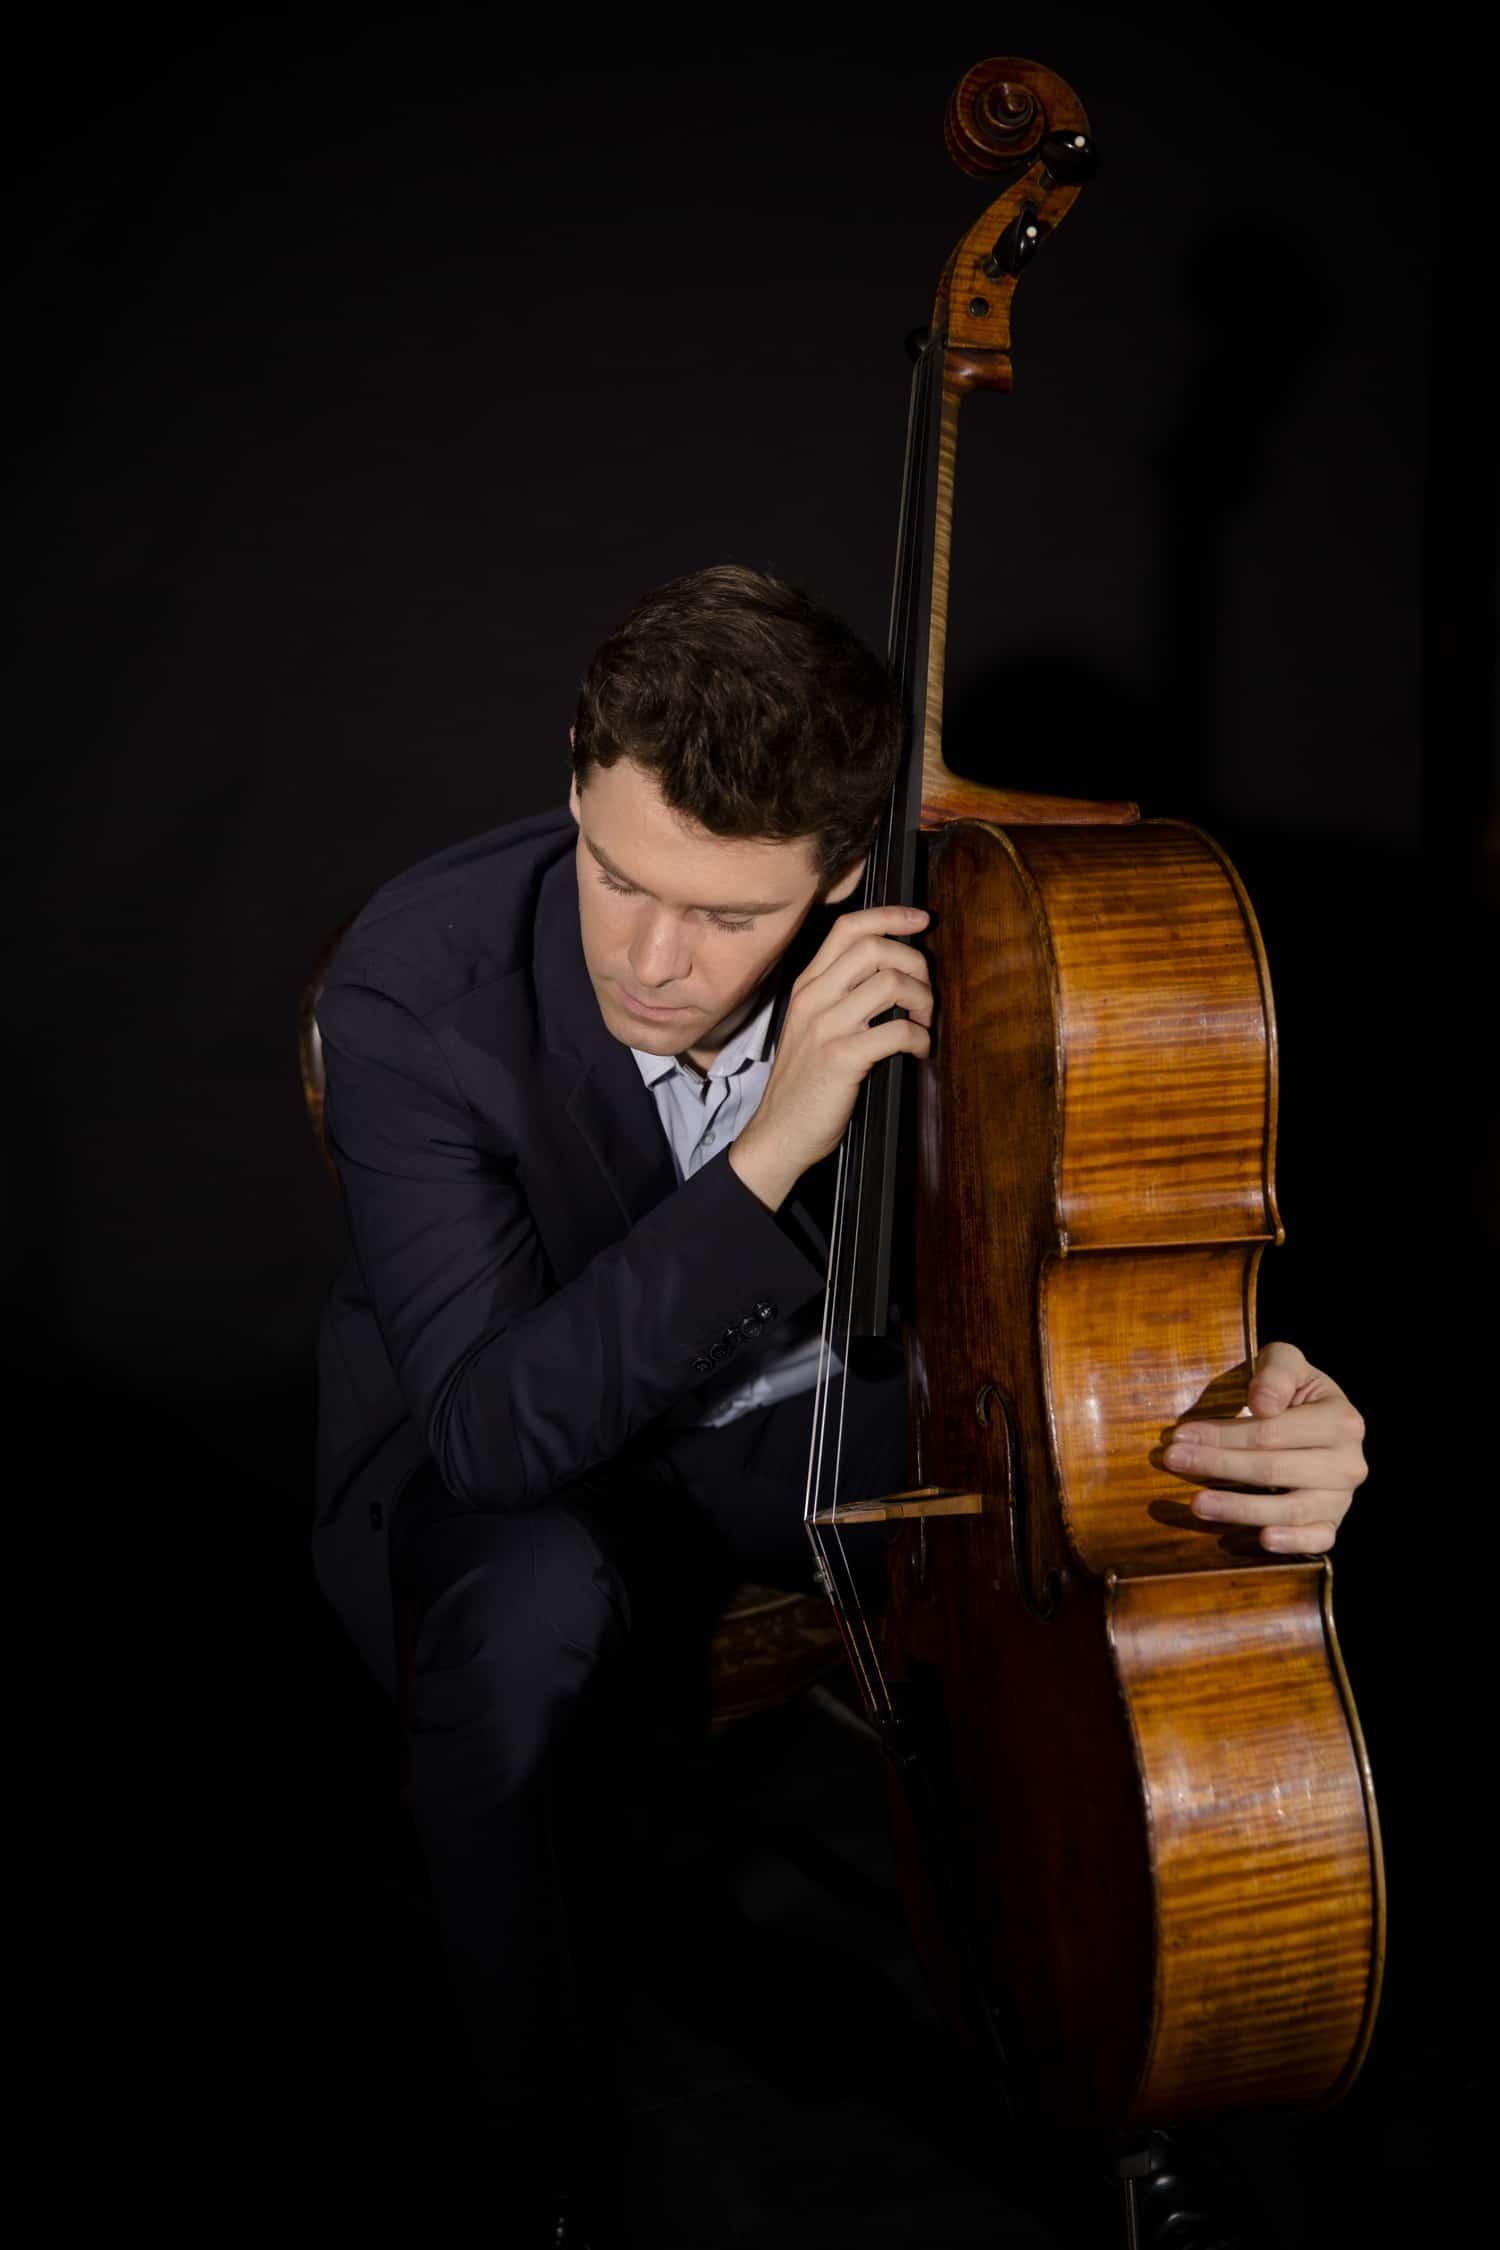 Idle labels sign solo cellists